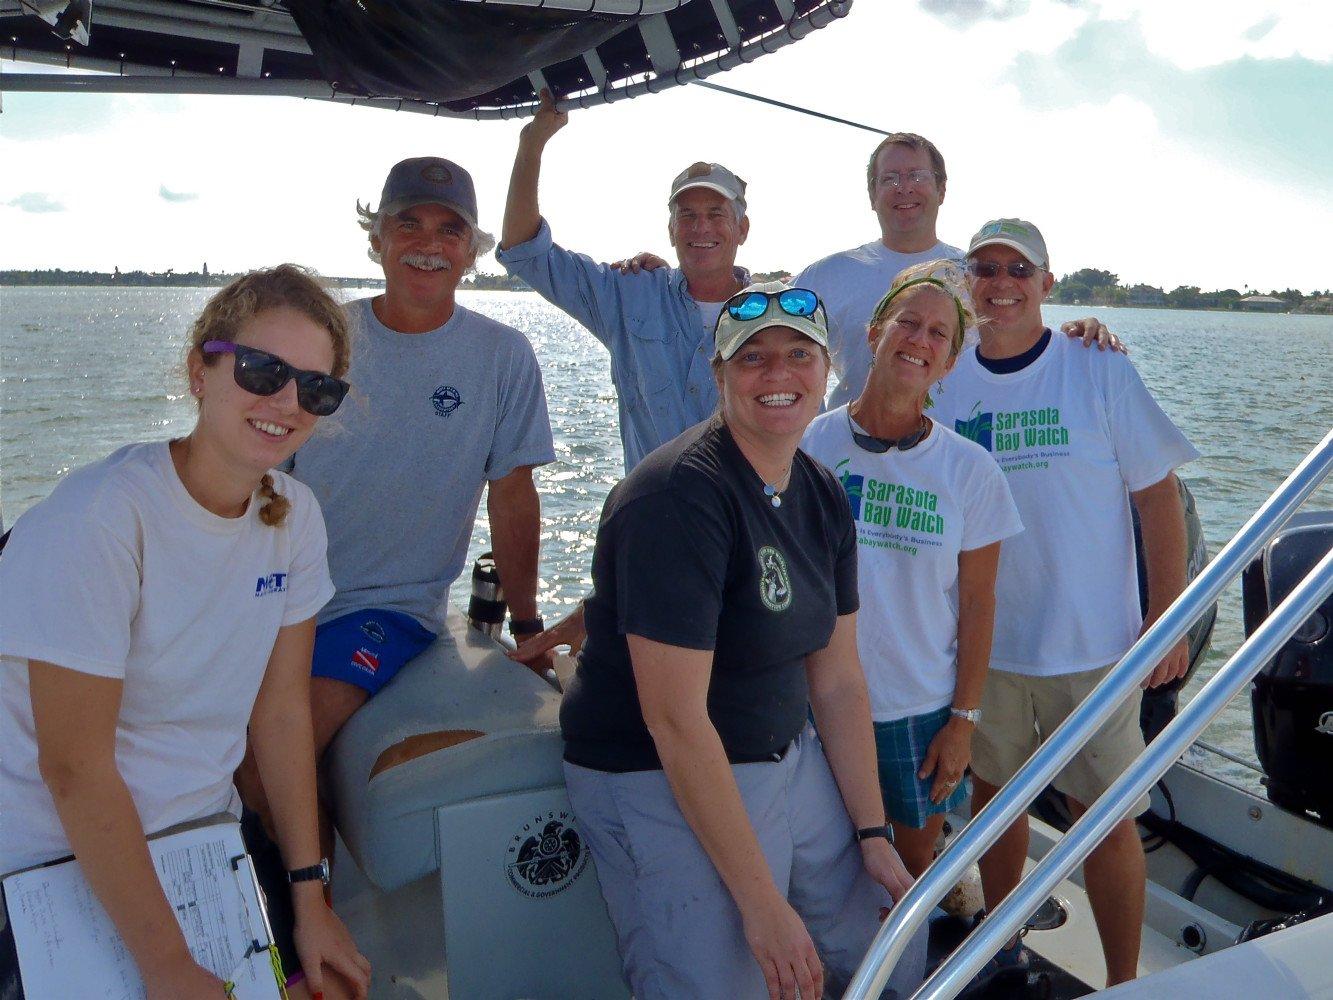 FLORIDA FISH & WILDLIFE RESEARCH INSTITUTE MOTE MARINE LABORATORY SARASOTA BAY ESTUARY PROGRAM & SARASOTA BAY WATCH